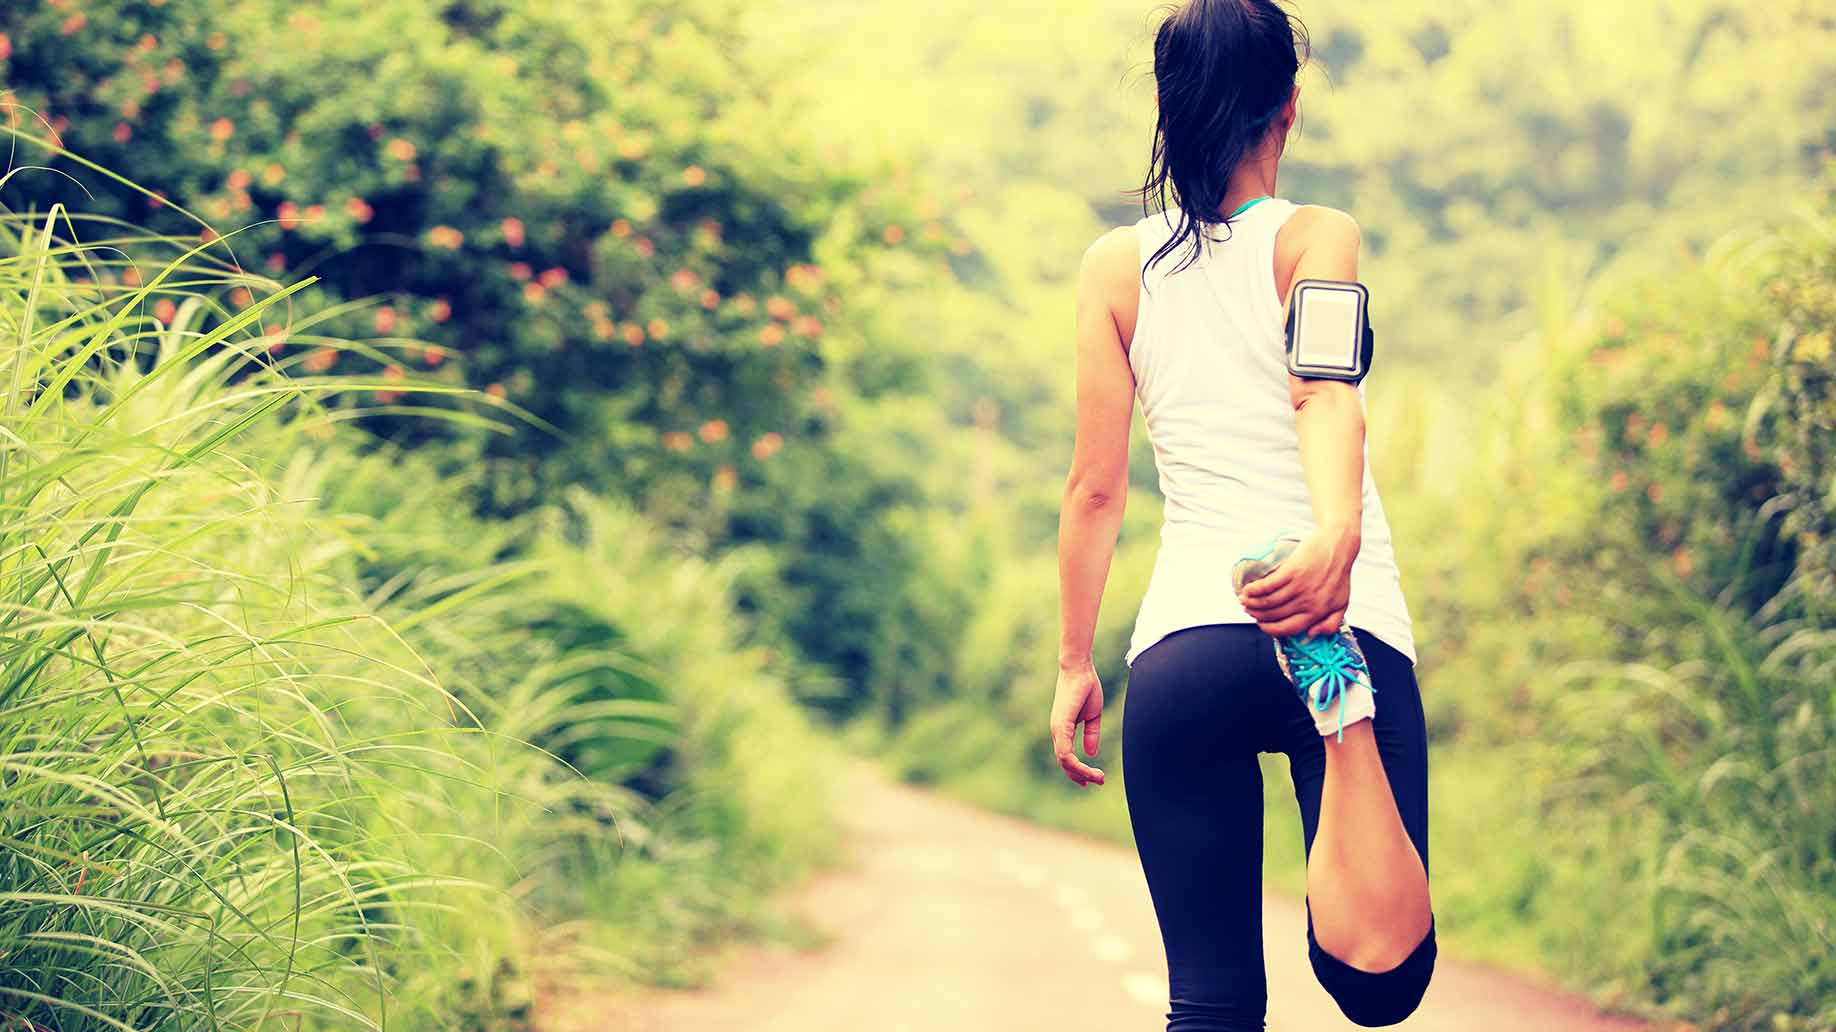 dark chocolate health benefits working out athletes antioxidants stress cardio running